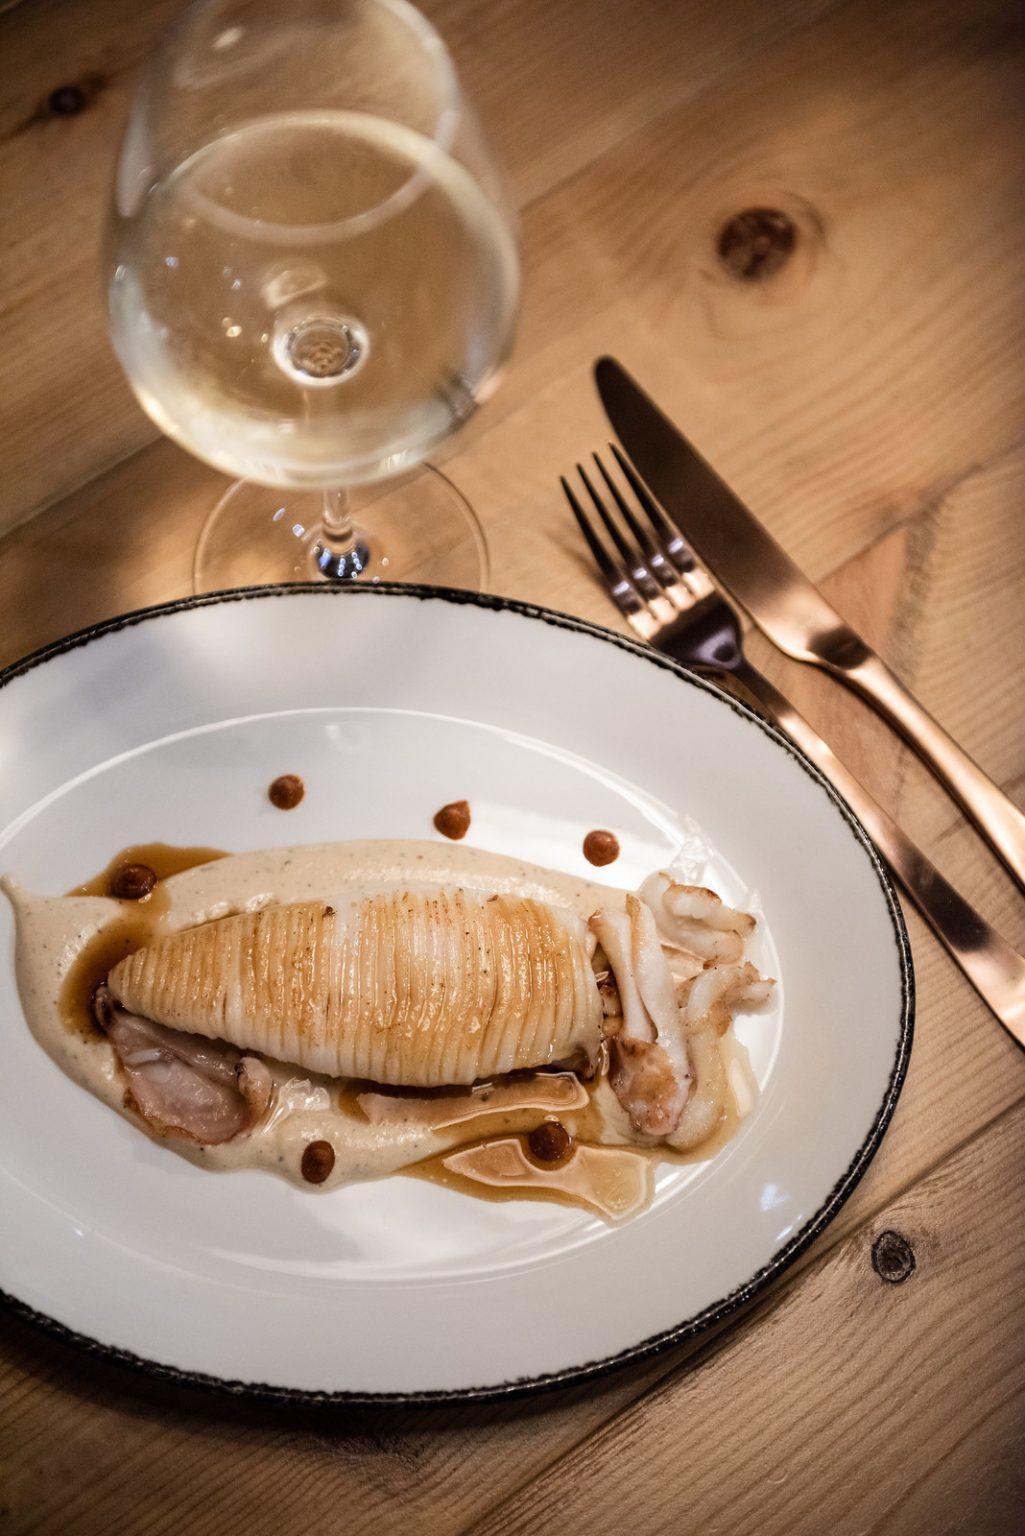 https://www.white-ibiza.com/wp-content/uploads/2020/11/cas-gasi-restaurant-2020-08-1025x1536.jpg